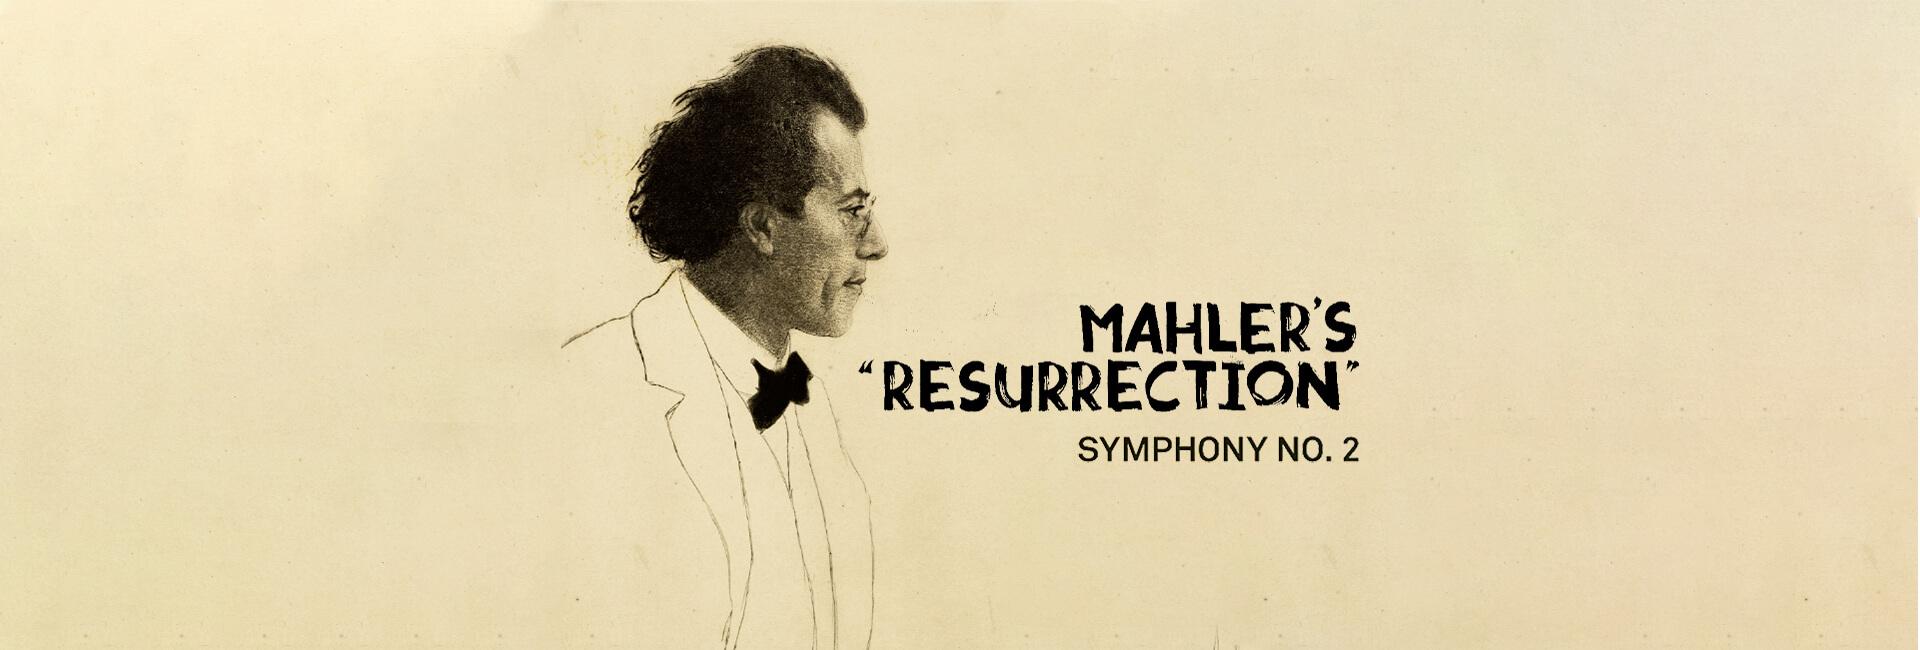 "Mahler Symphony No  2 (""Resurrection"") - The UCLA Herb"